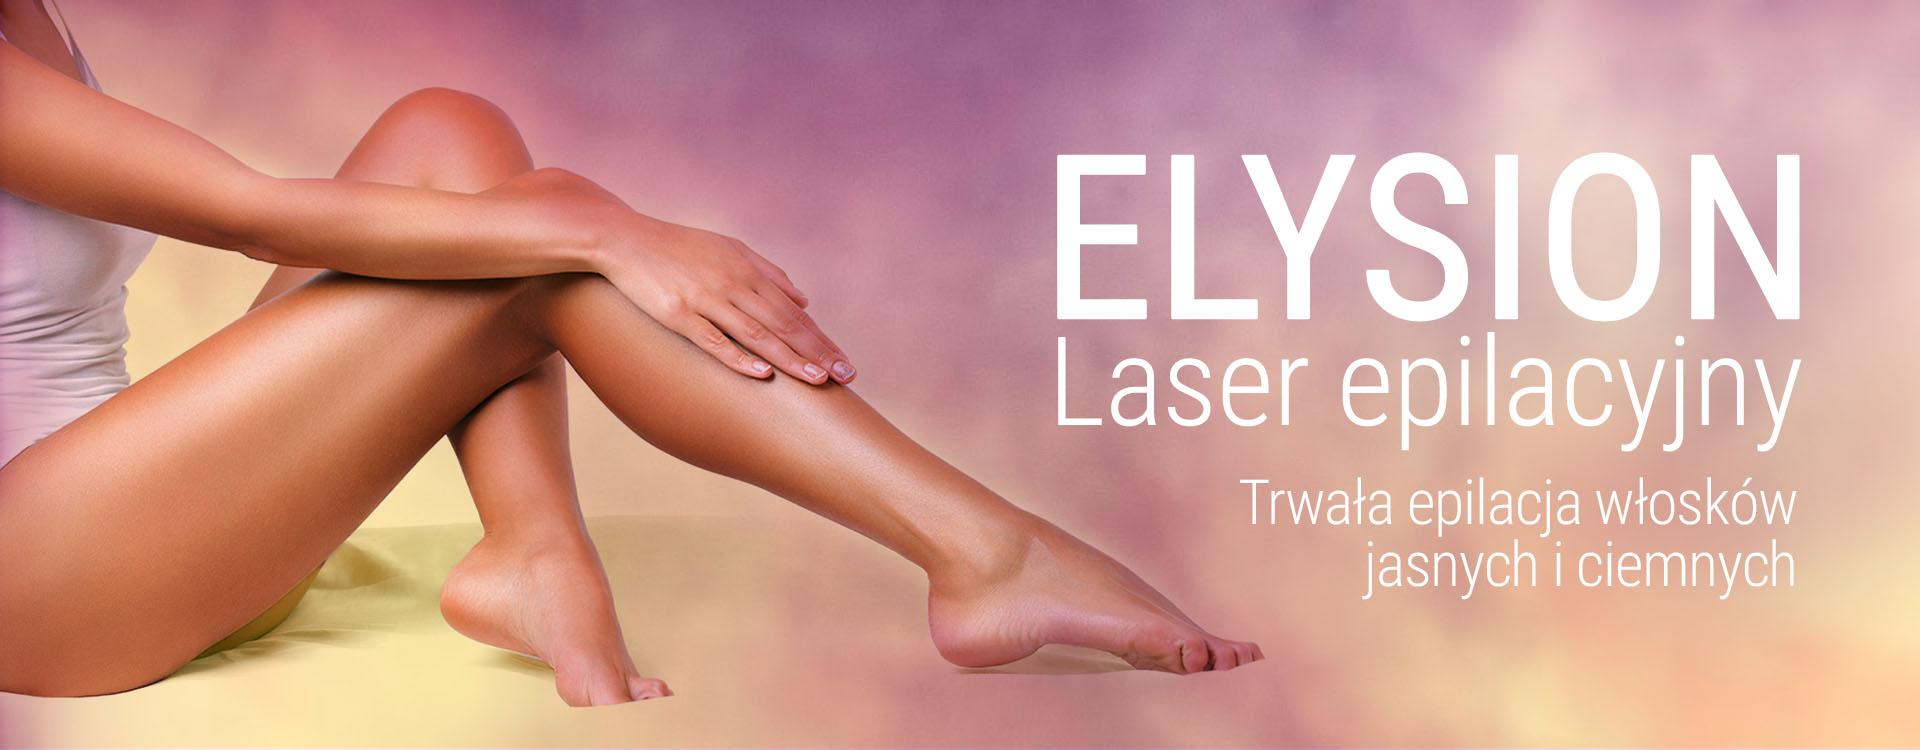 Laser epilacyjny Elysion